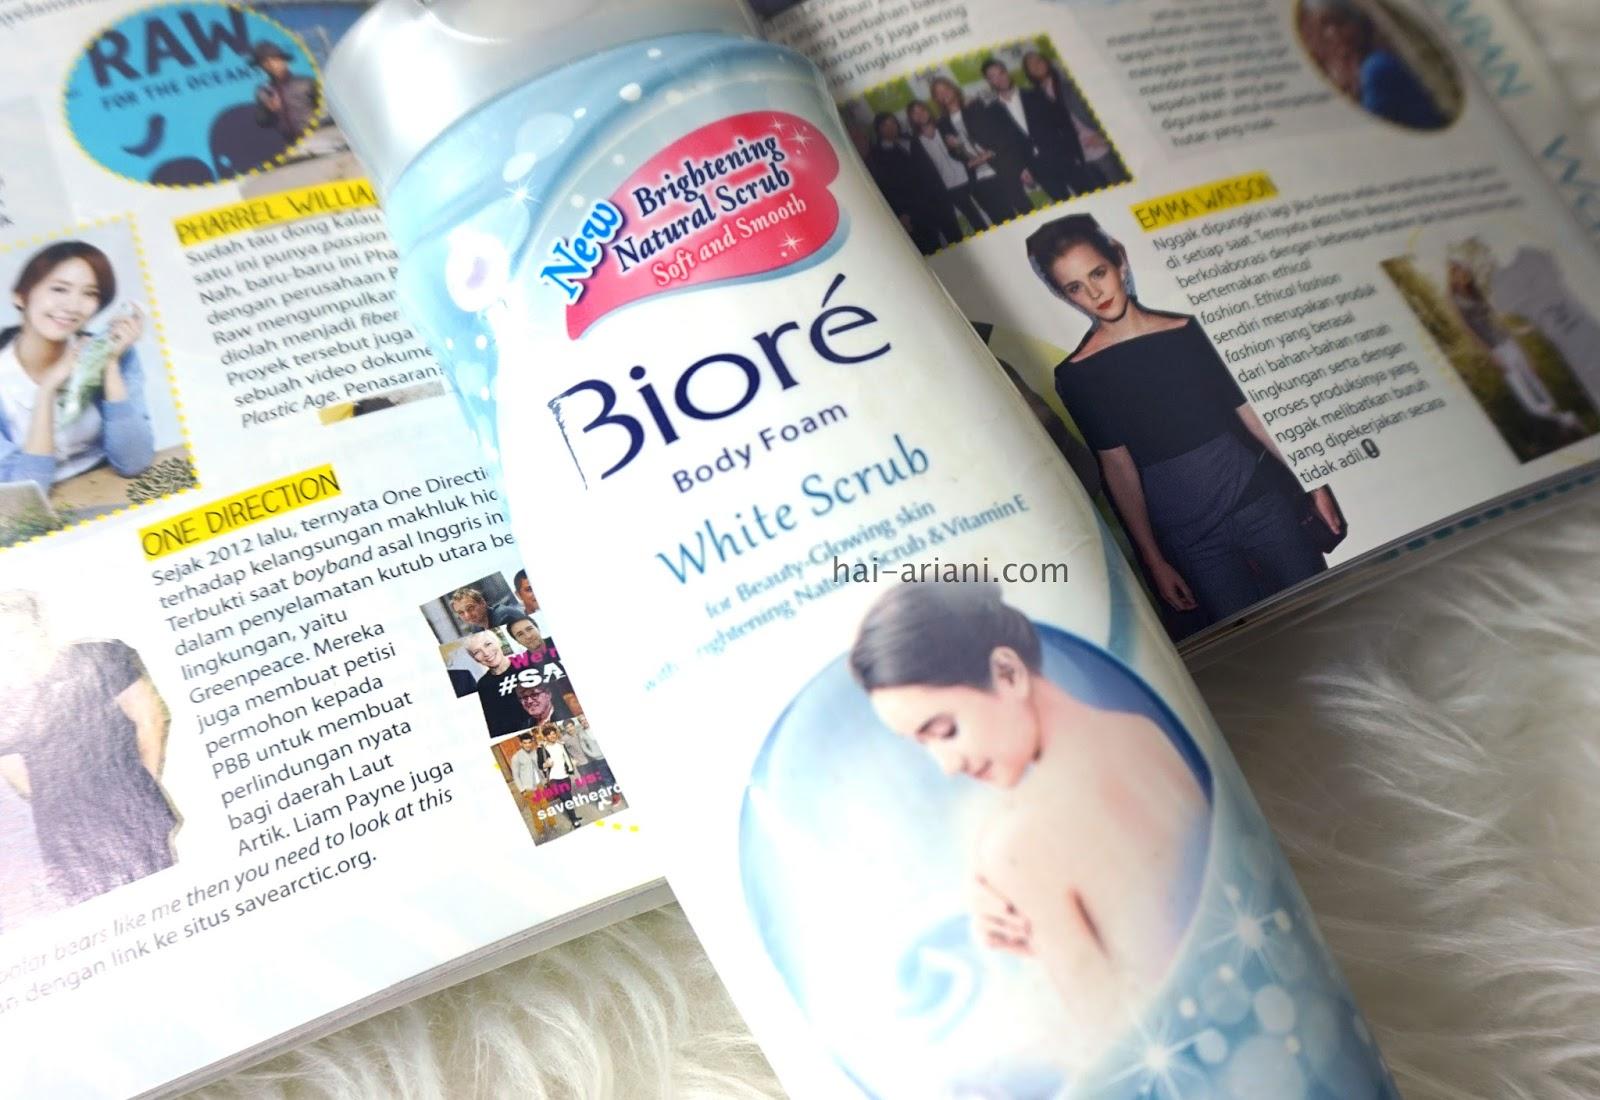 BIORE BODY FOAM WHITE SCRUB REVIEW